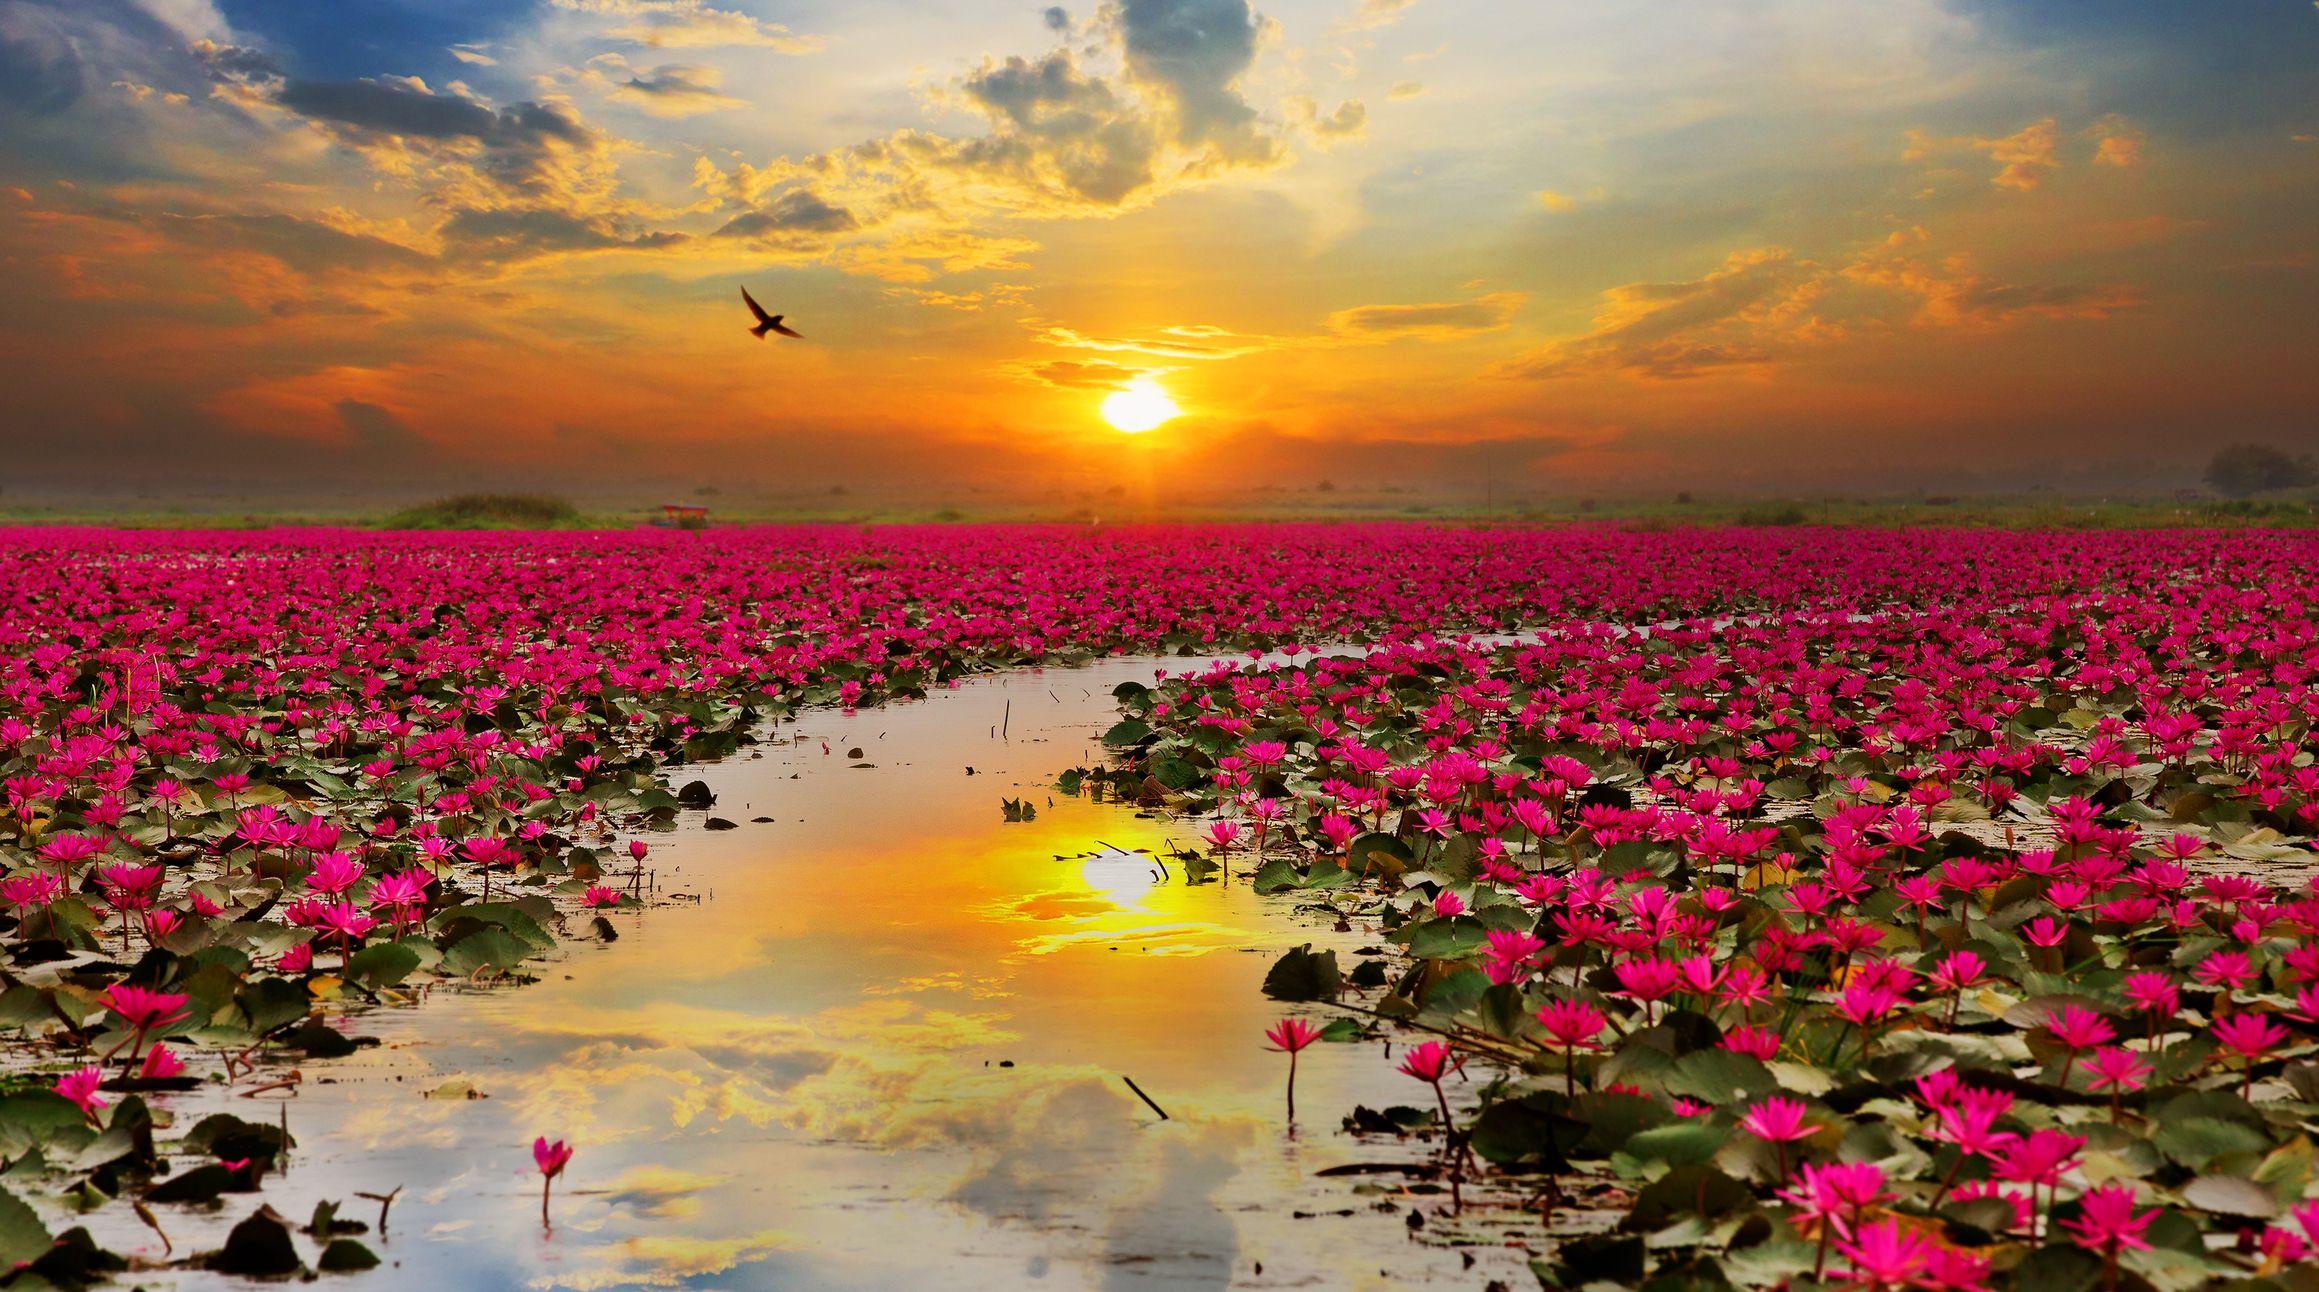 Lotus flowers thailand asien pinterest lotus flowers lotus flowers izmirmasajfo Images